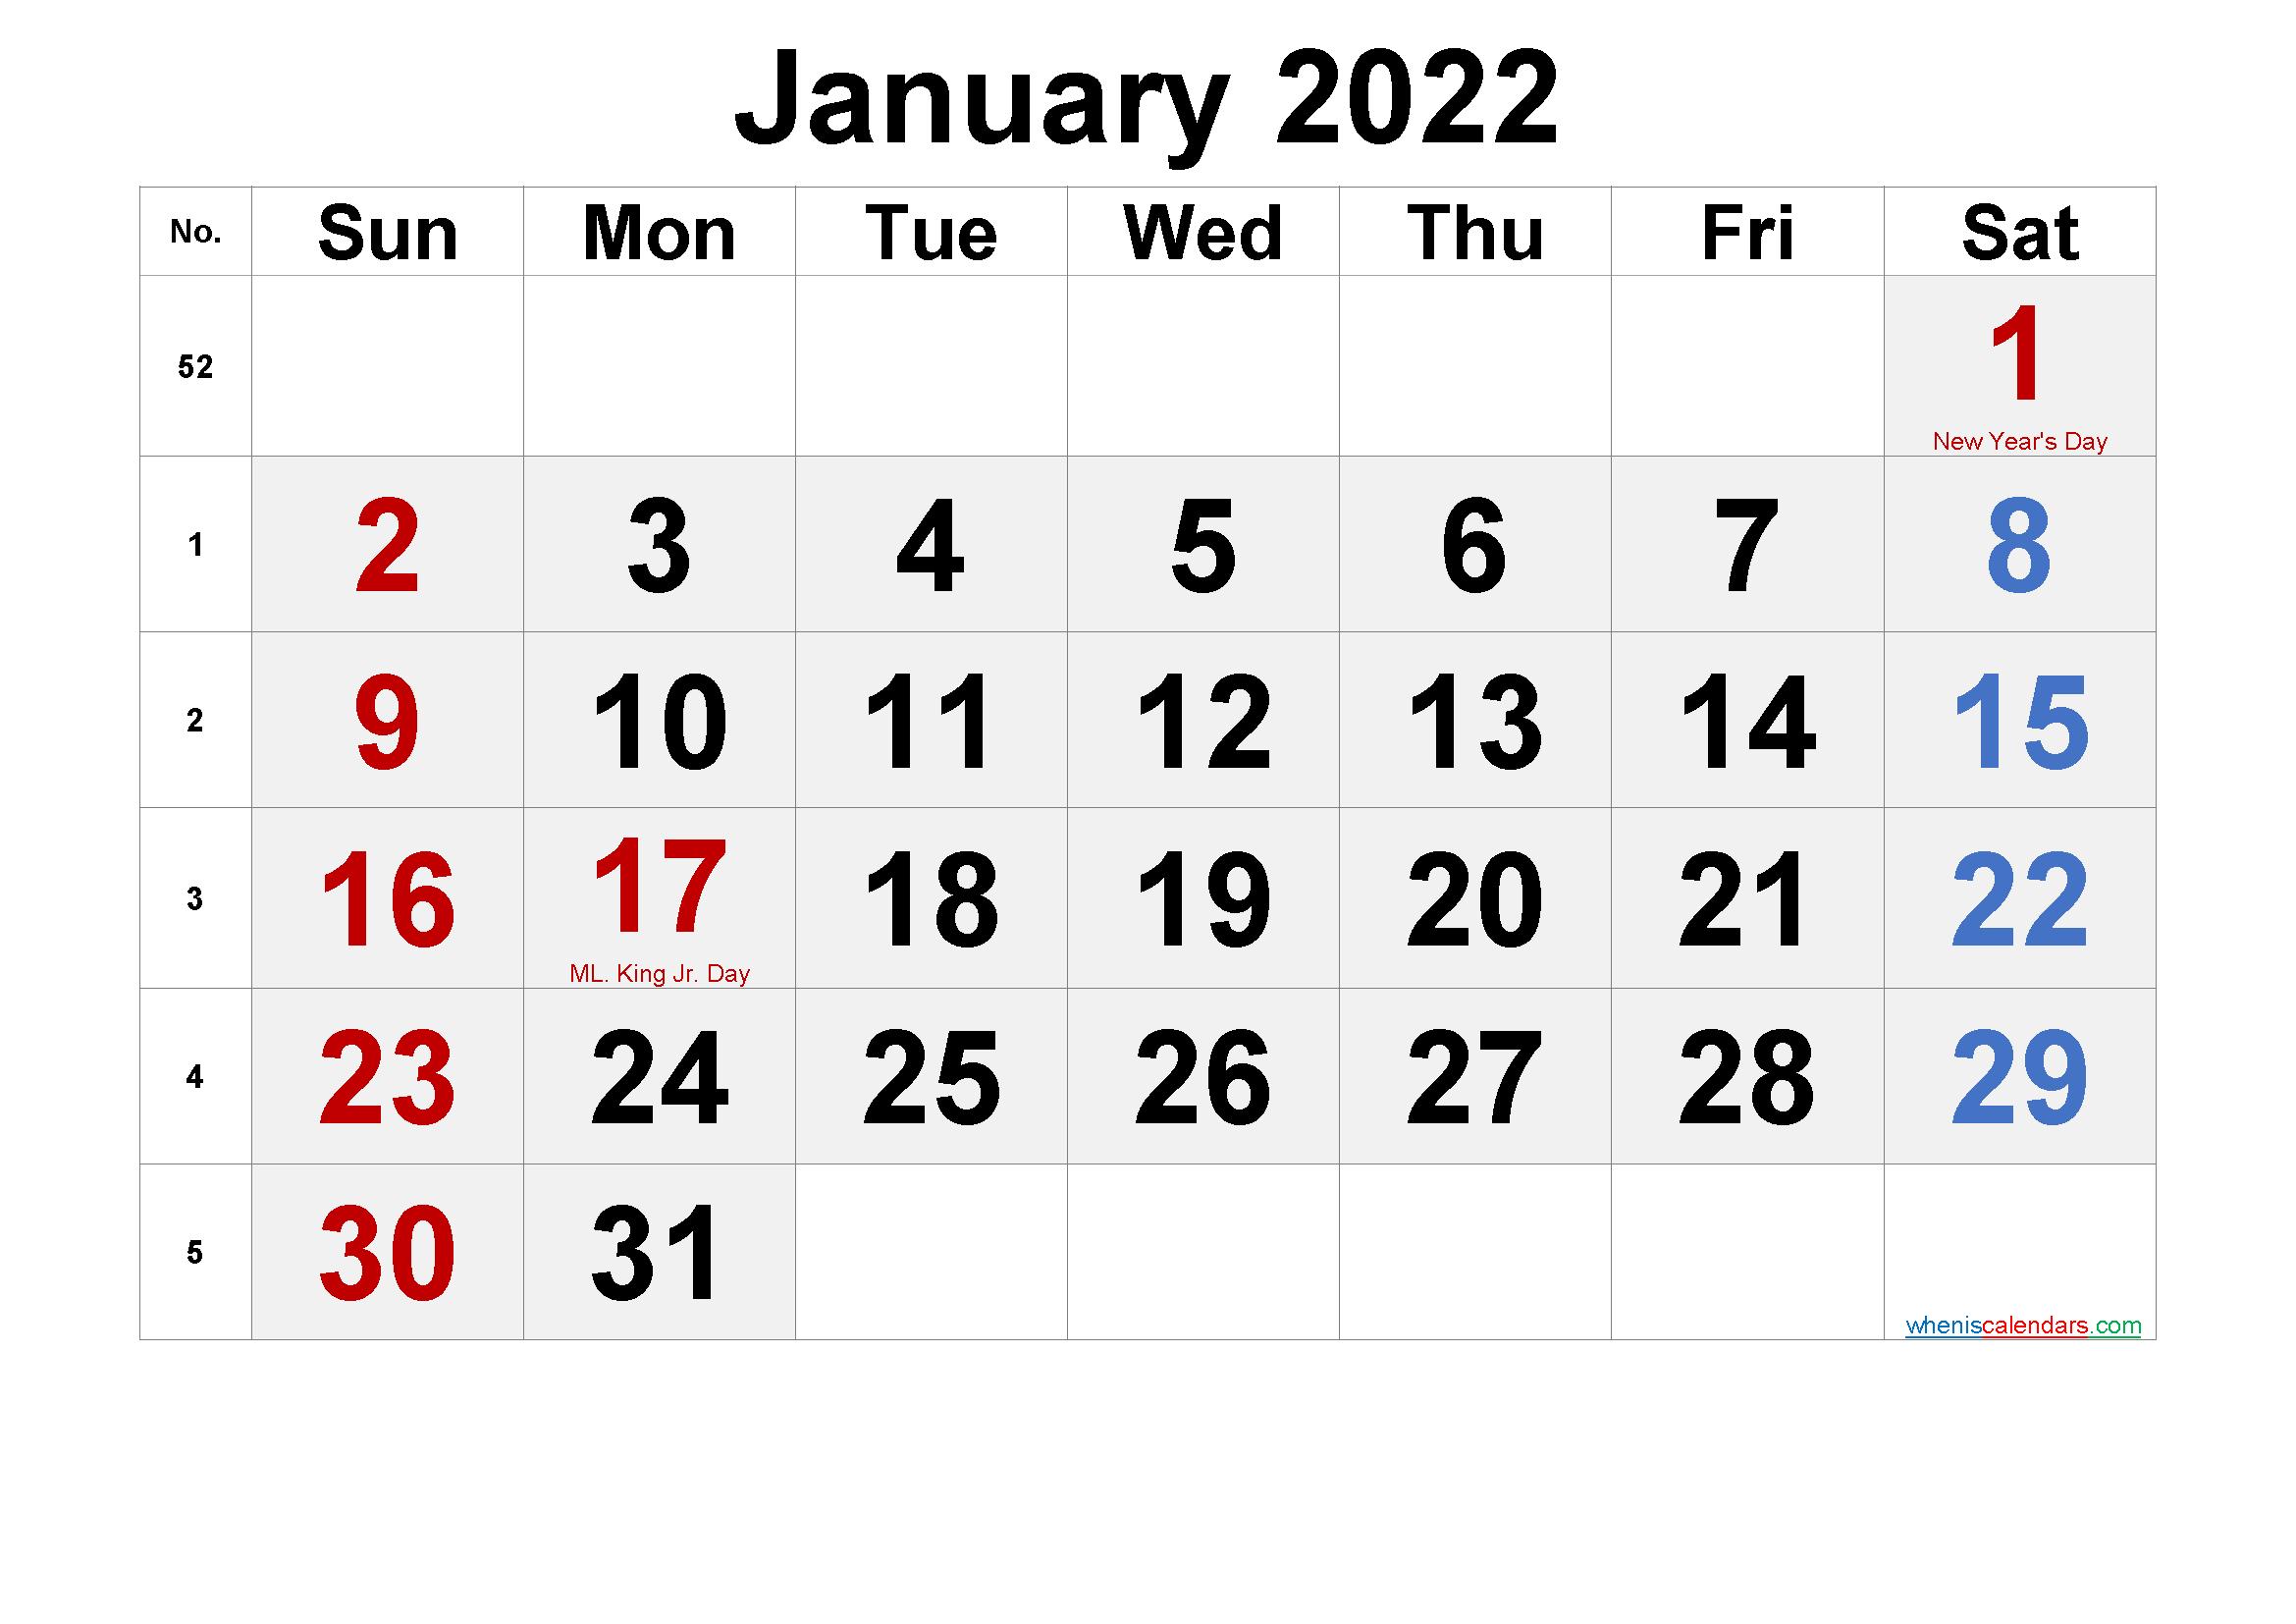 2022 Calendar Png.Free Printable January 2022 Calendar Pdf And Png Calendar Printables Printable Calendar Template Calendar Template